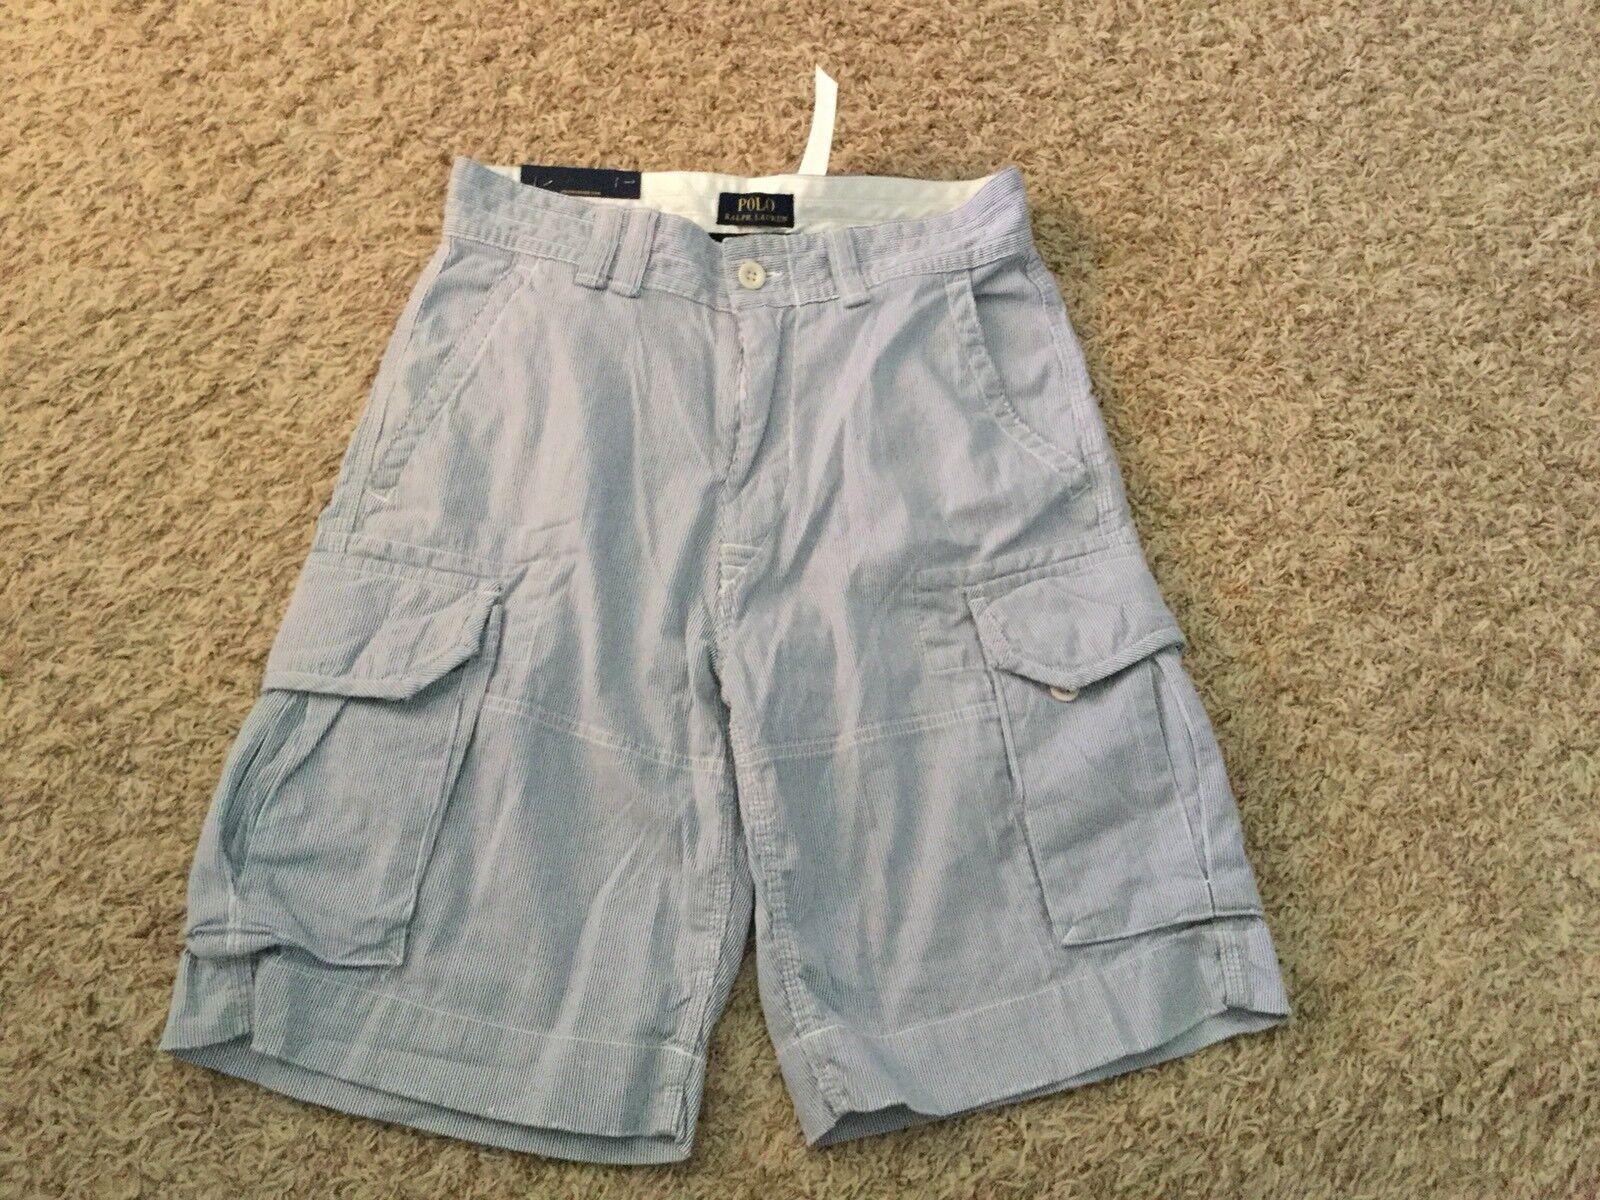 NWT Polo Ralph Lauren Cargo Shorts bluee Stripe - Mens 29 (MEASURED 29x10) (3466)